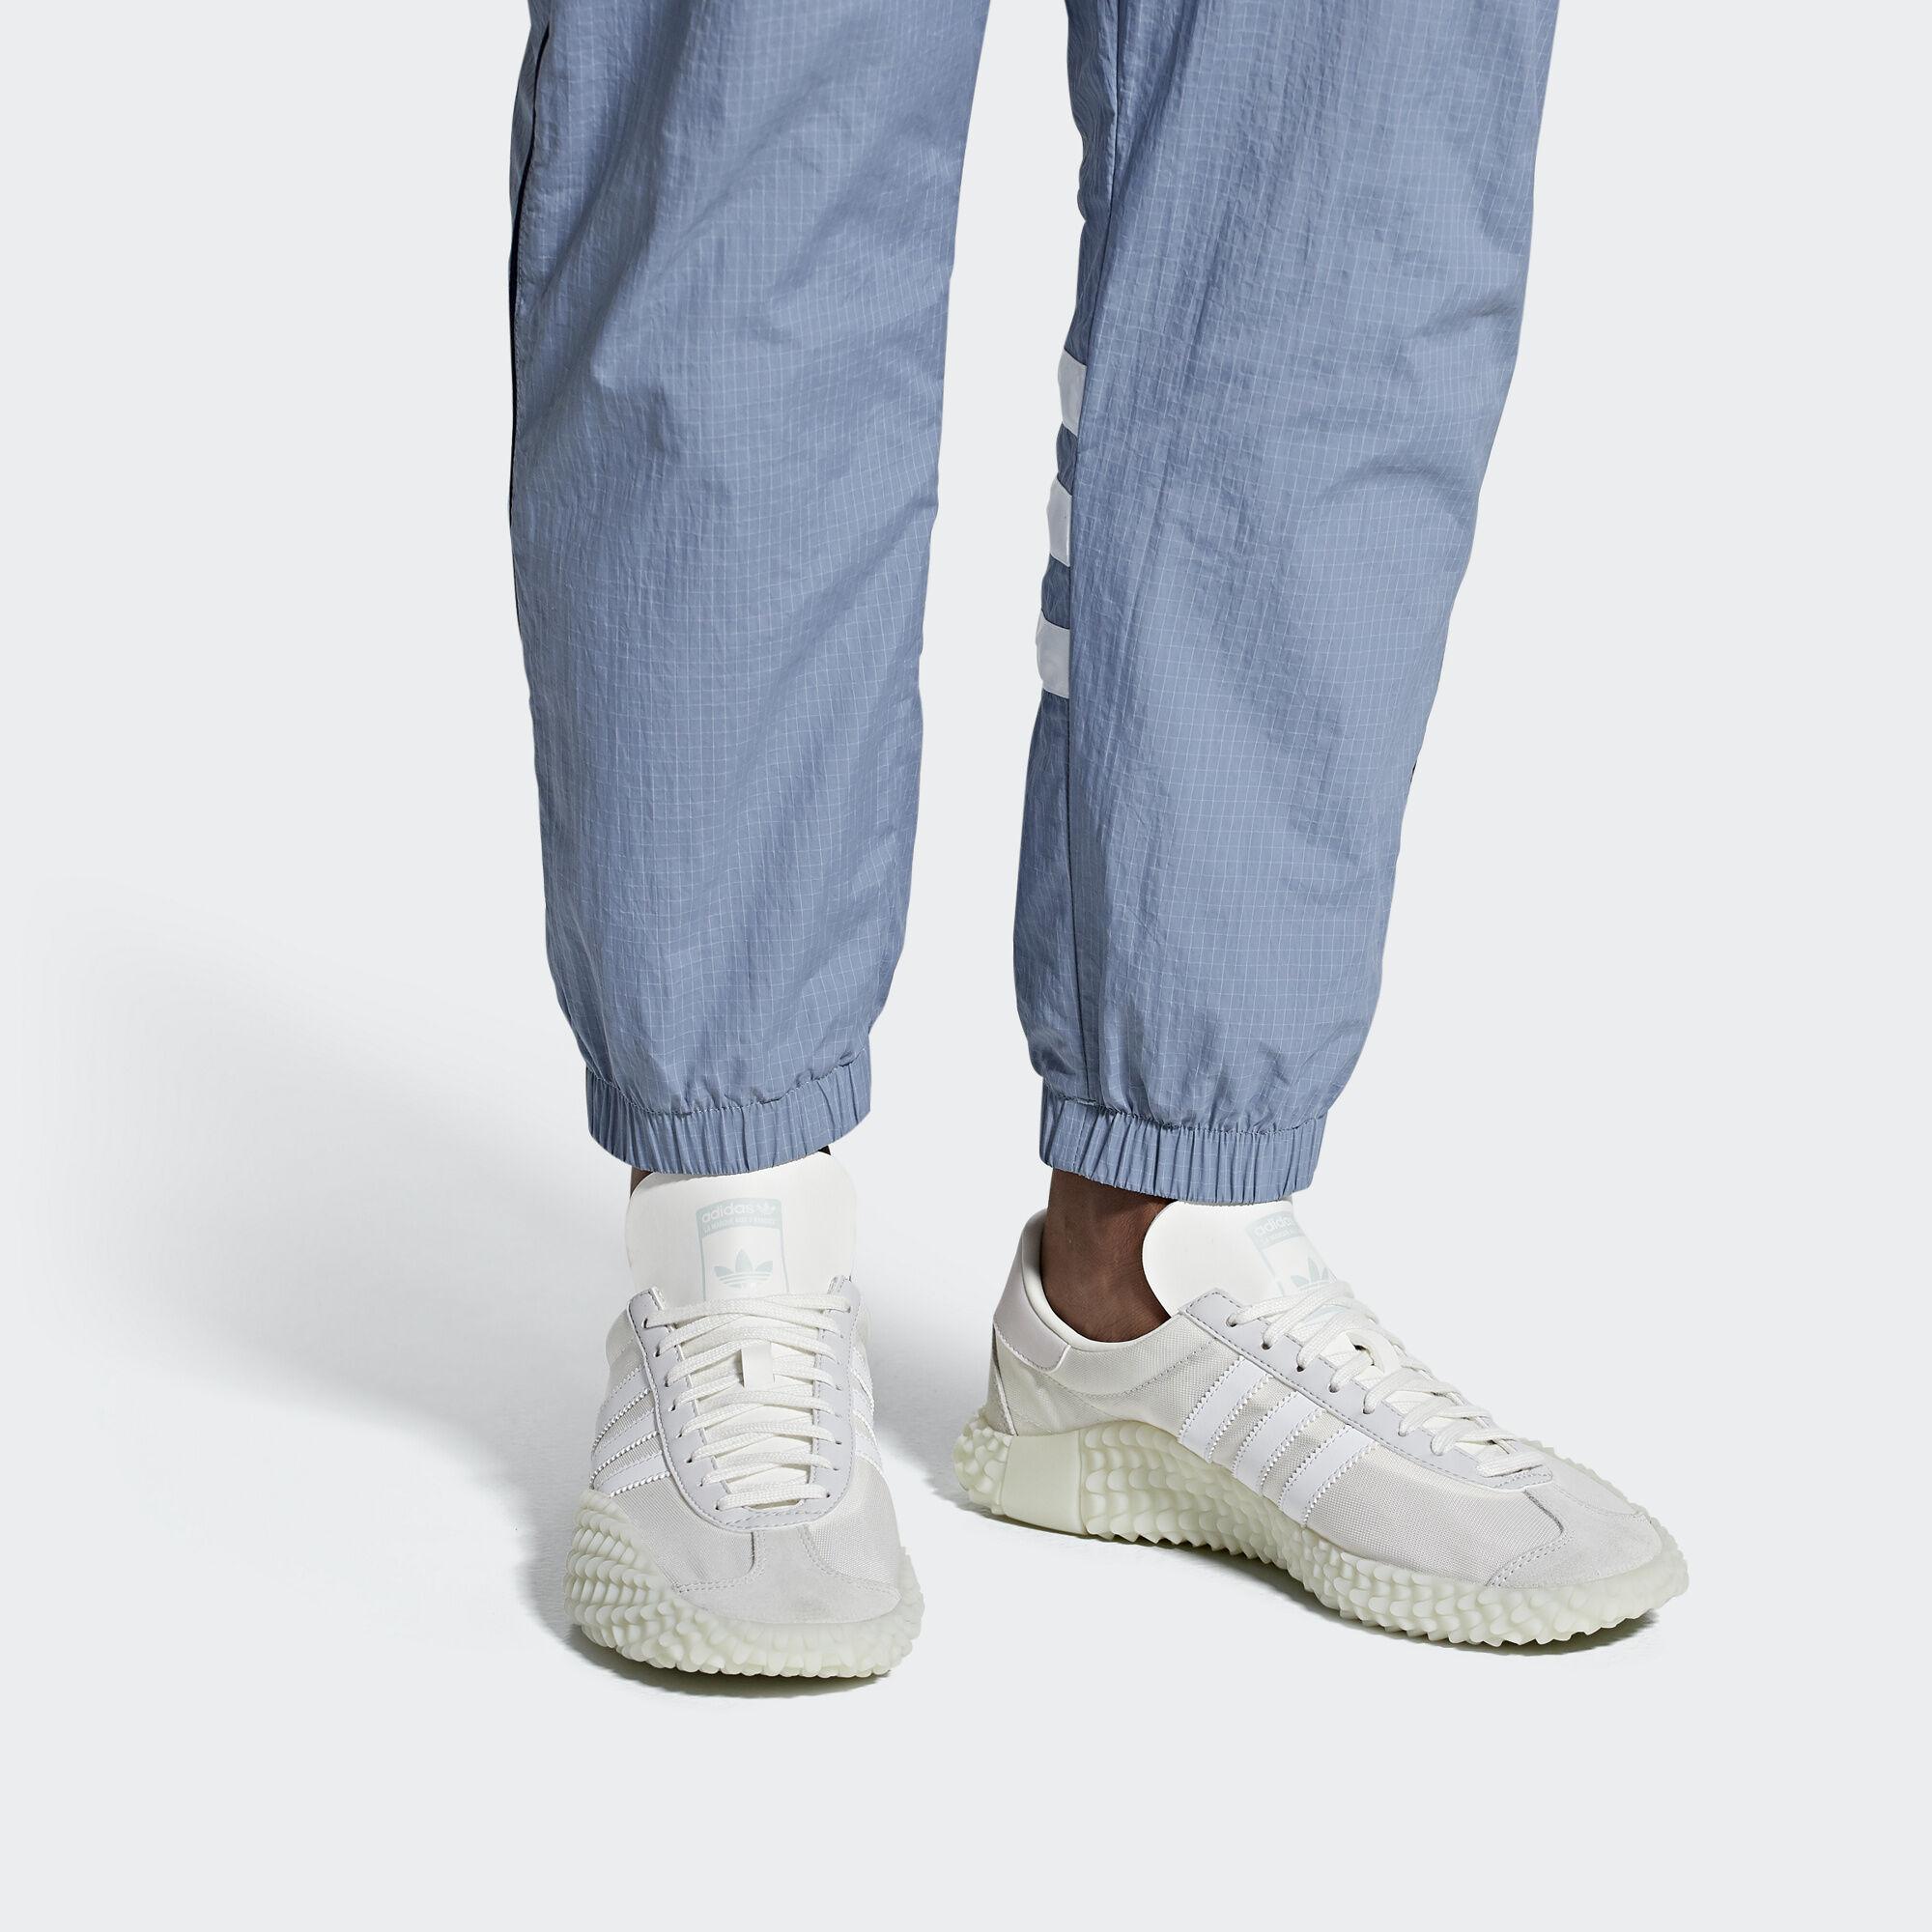 new style 3049b 466d1 adidas CountryxKamanda Shoes - Vit  adidas Sweden